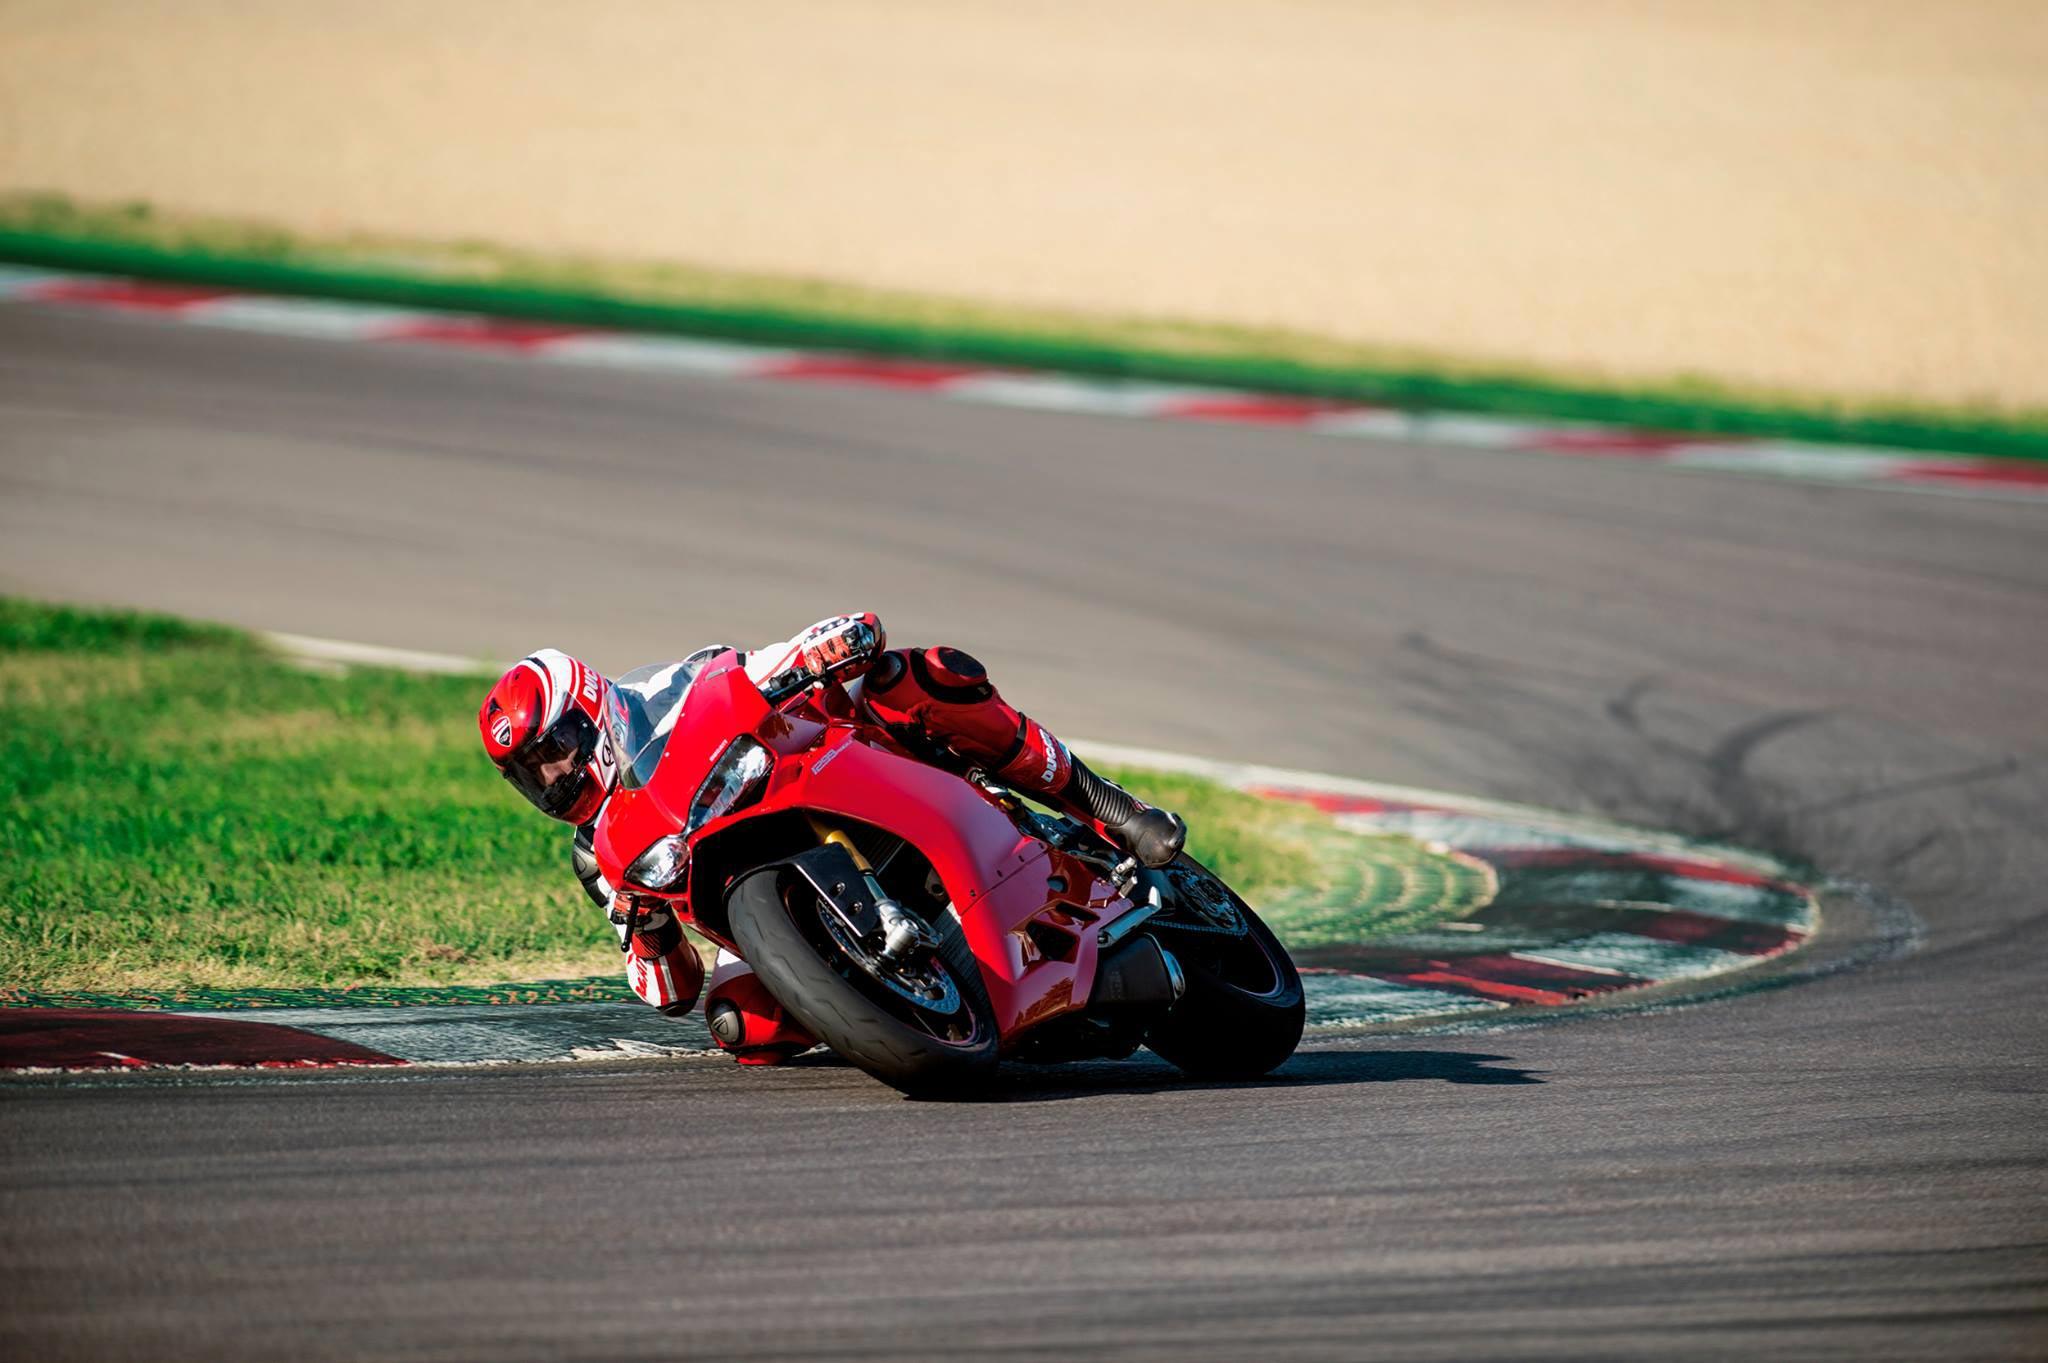 2015 New Ducati Panigale 1299